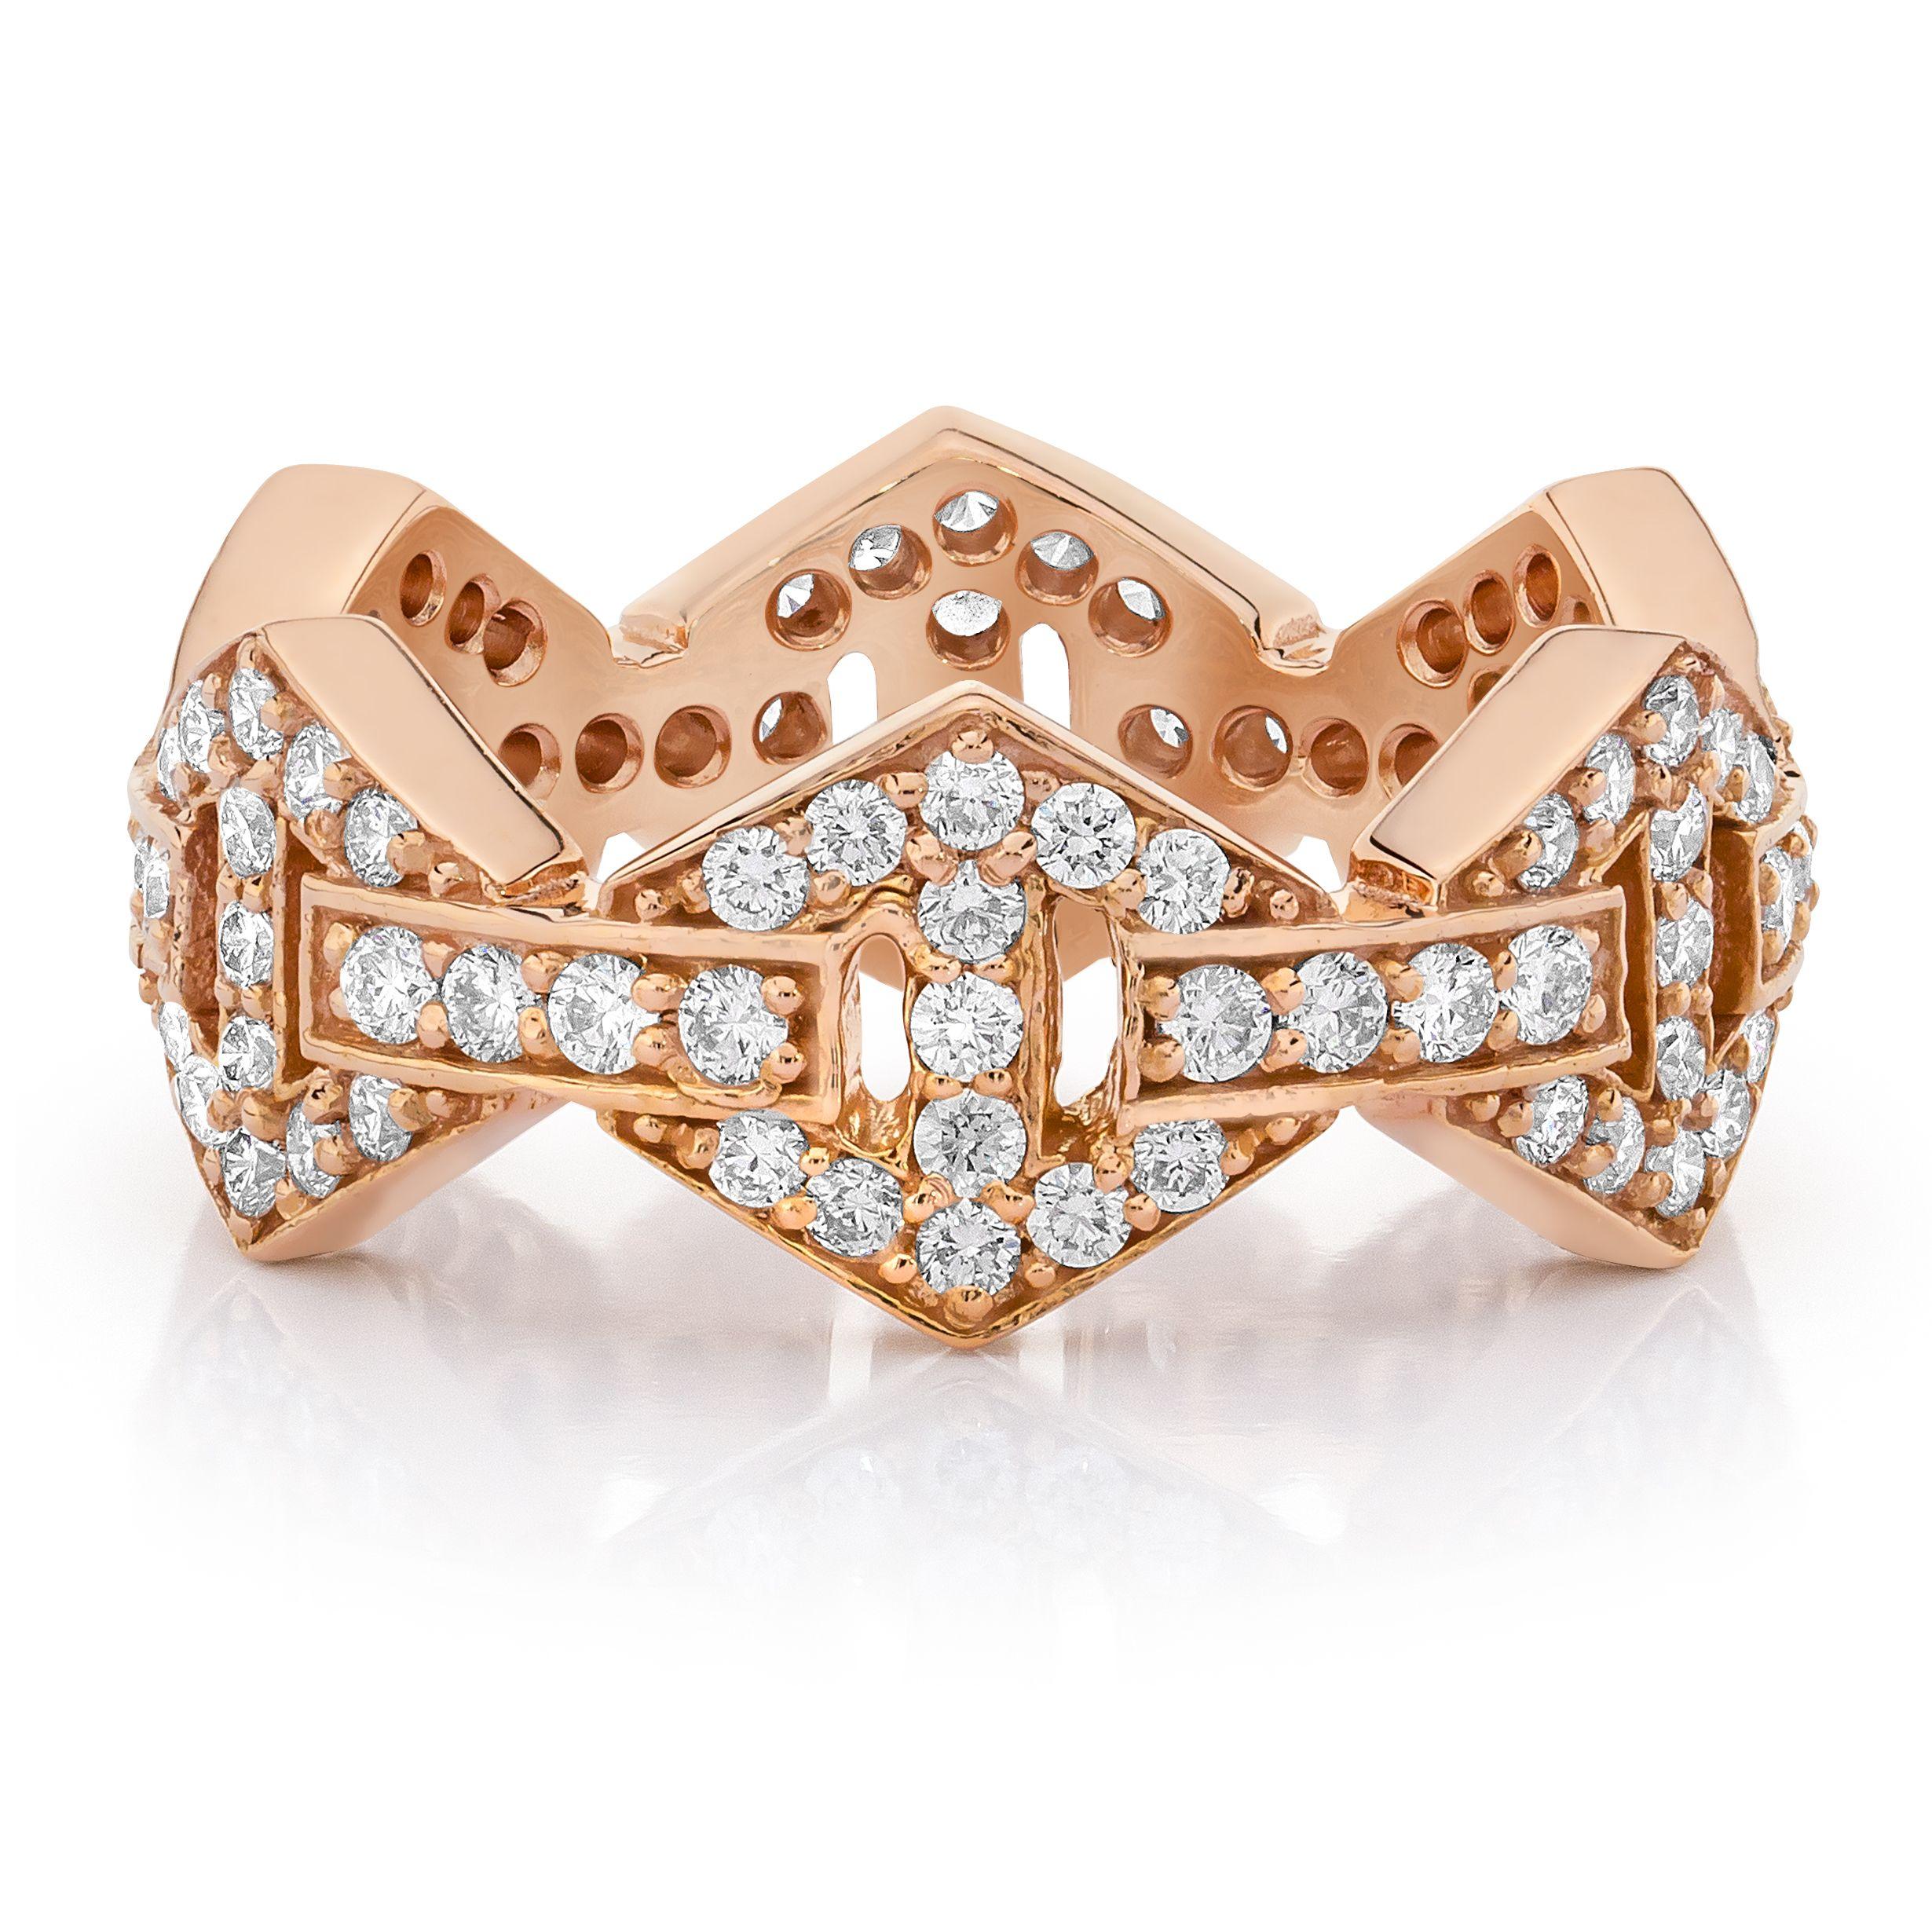 Walters Faith Keynes 18K Signature Black Rhodium Diamond Bar Hexagon Stackable Ring Silver r1KZ5Rp14Q